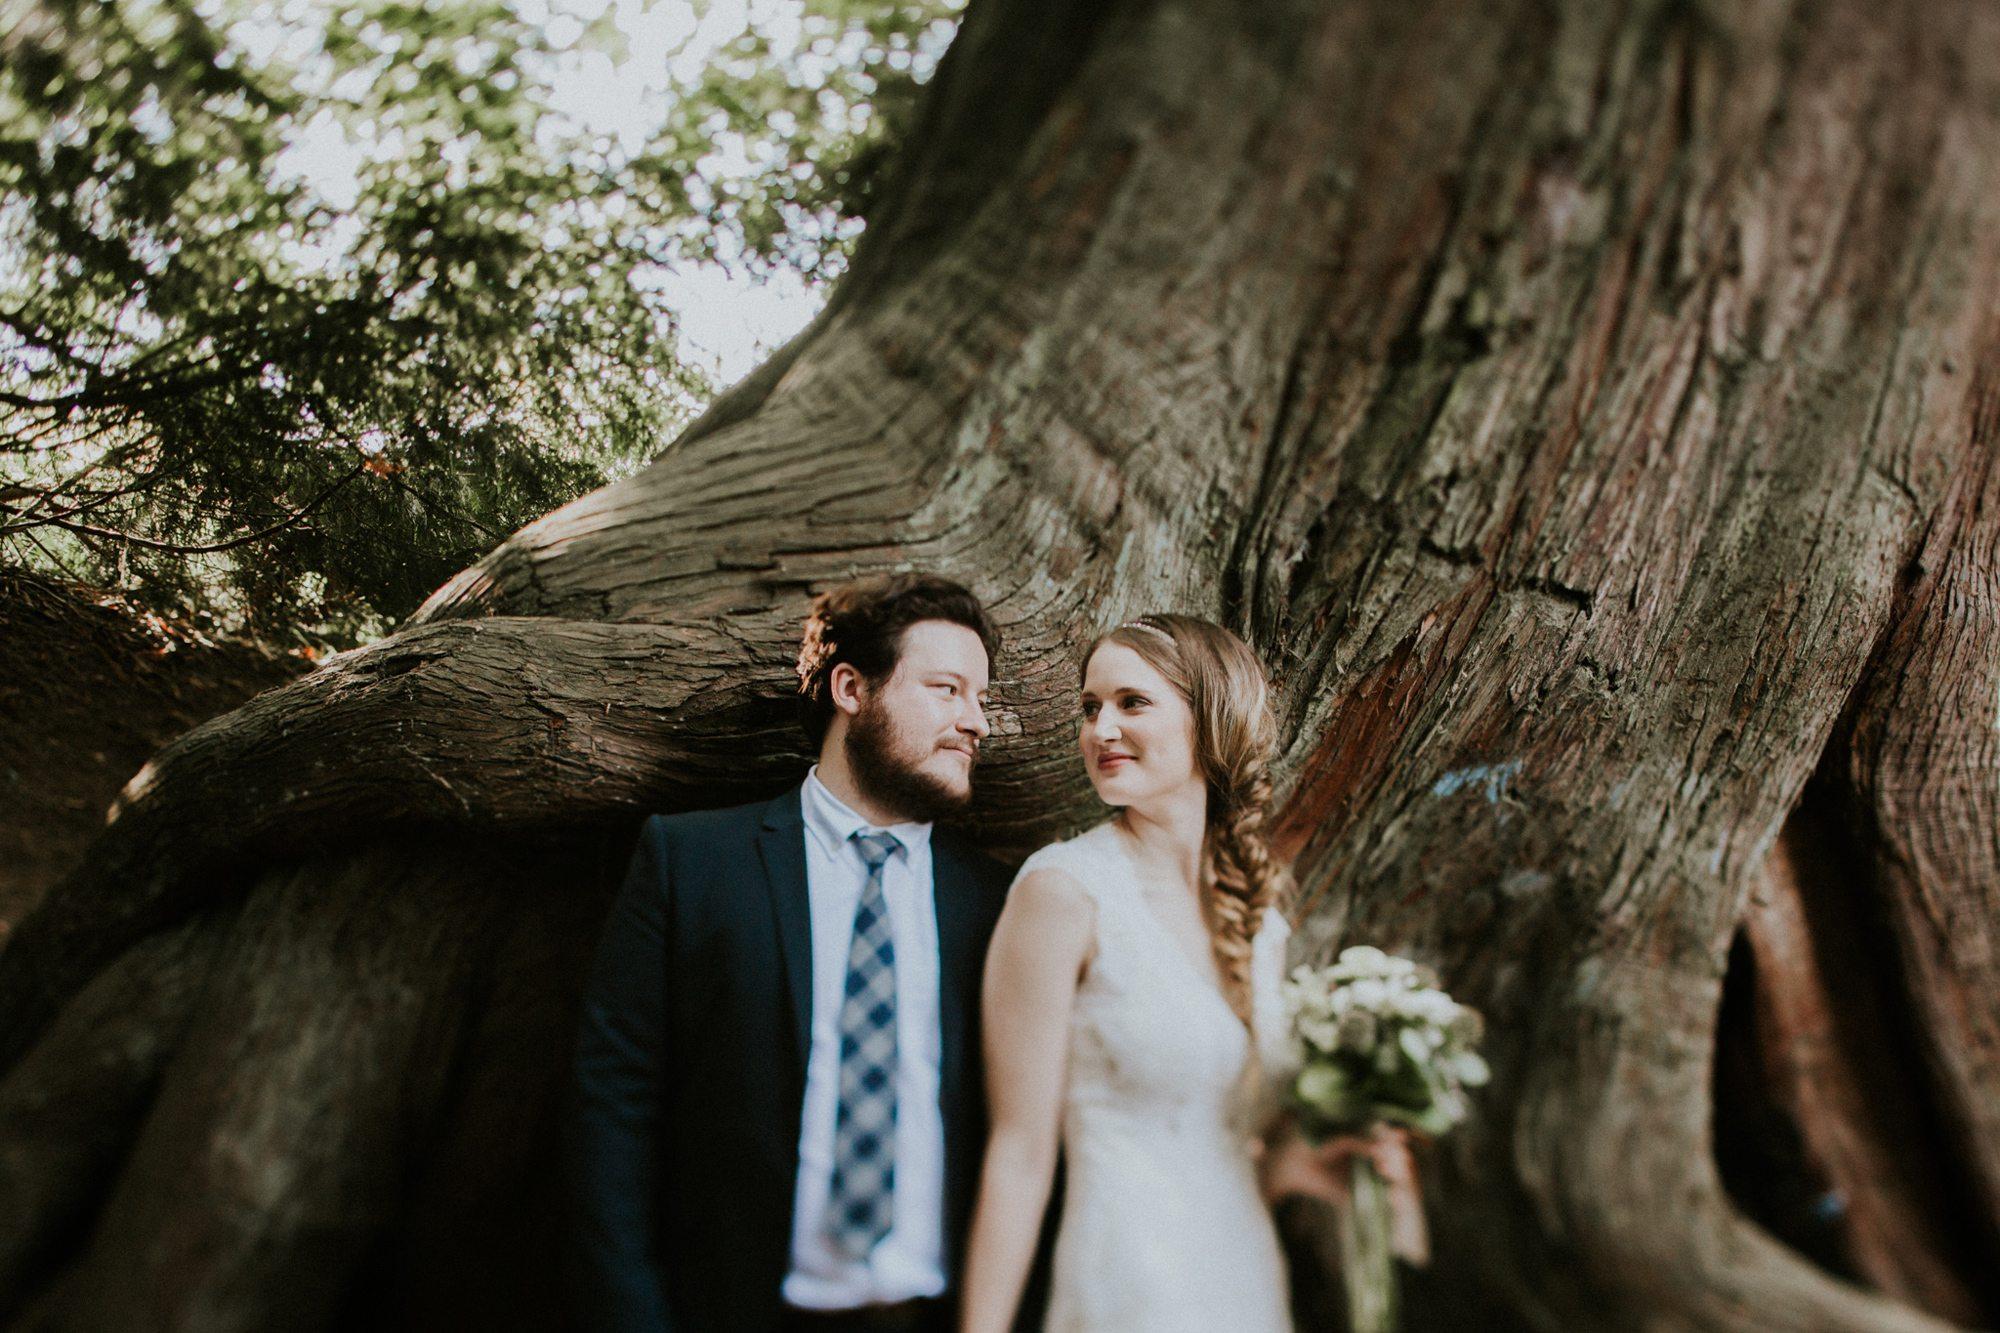 863-abbotsford-wedding-photographer